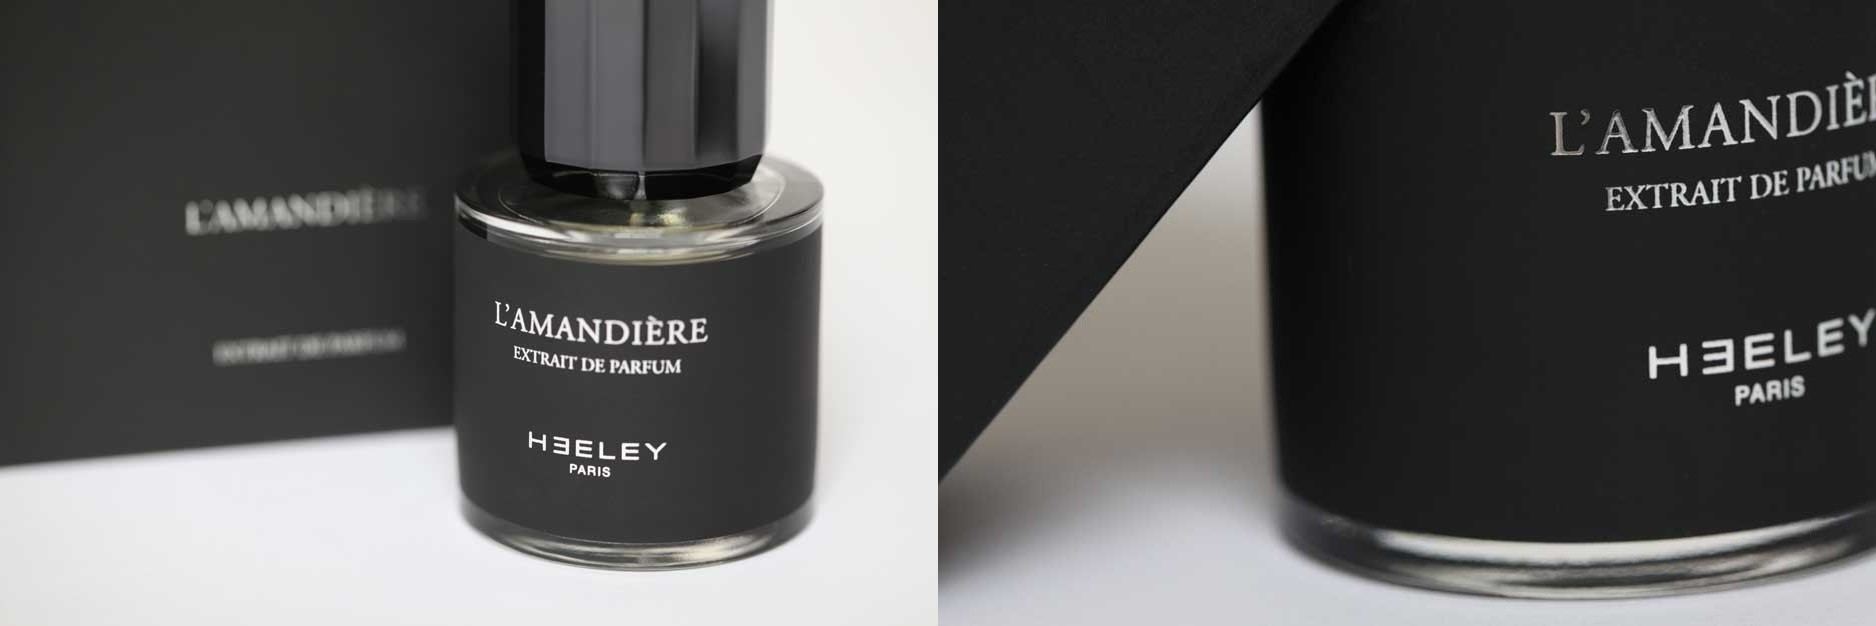 Heeley L'Amandiere ekstrakt perfum